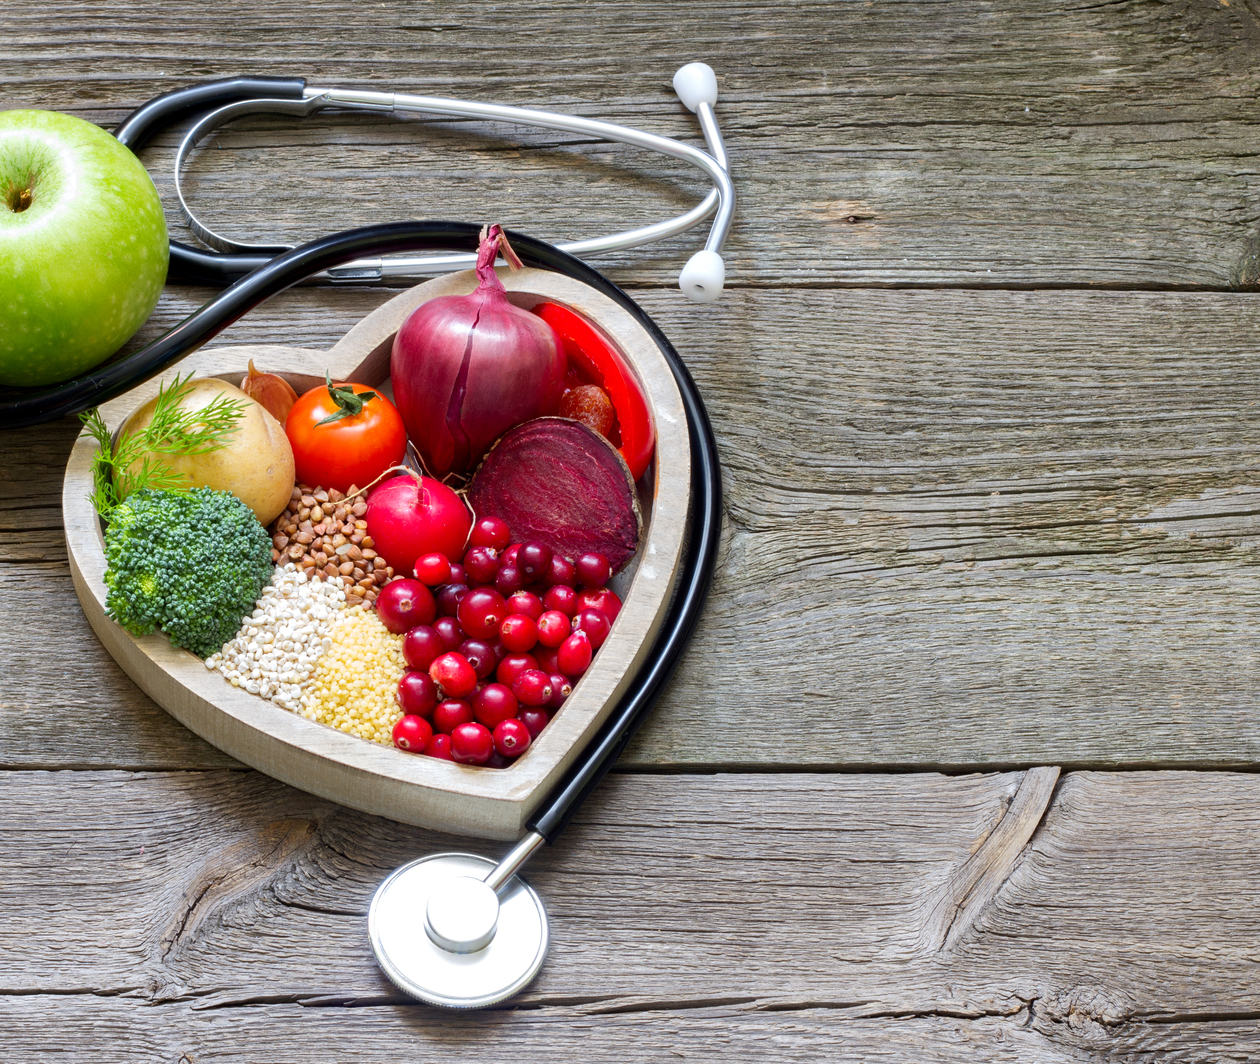 HND701.1 Demystifying Diabetes